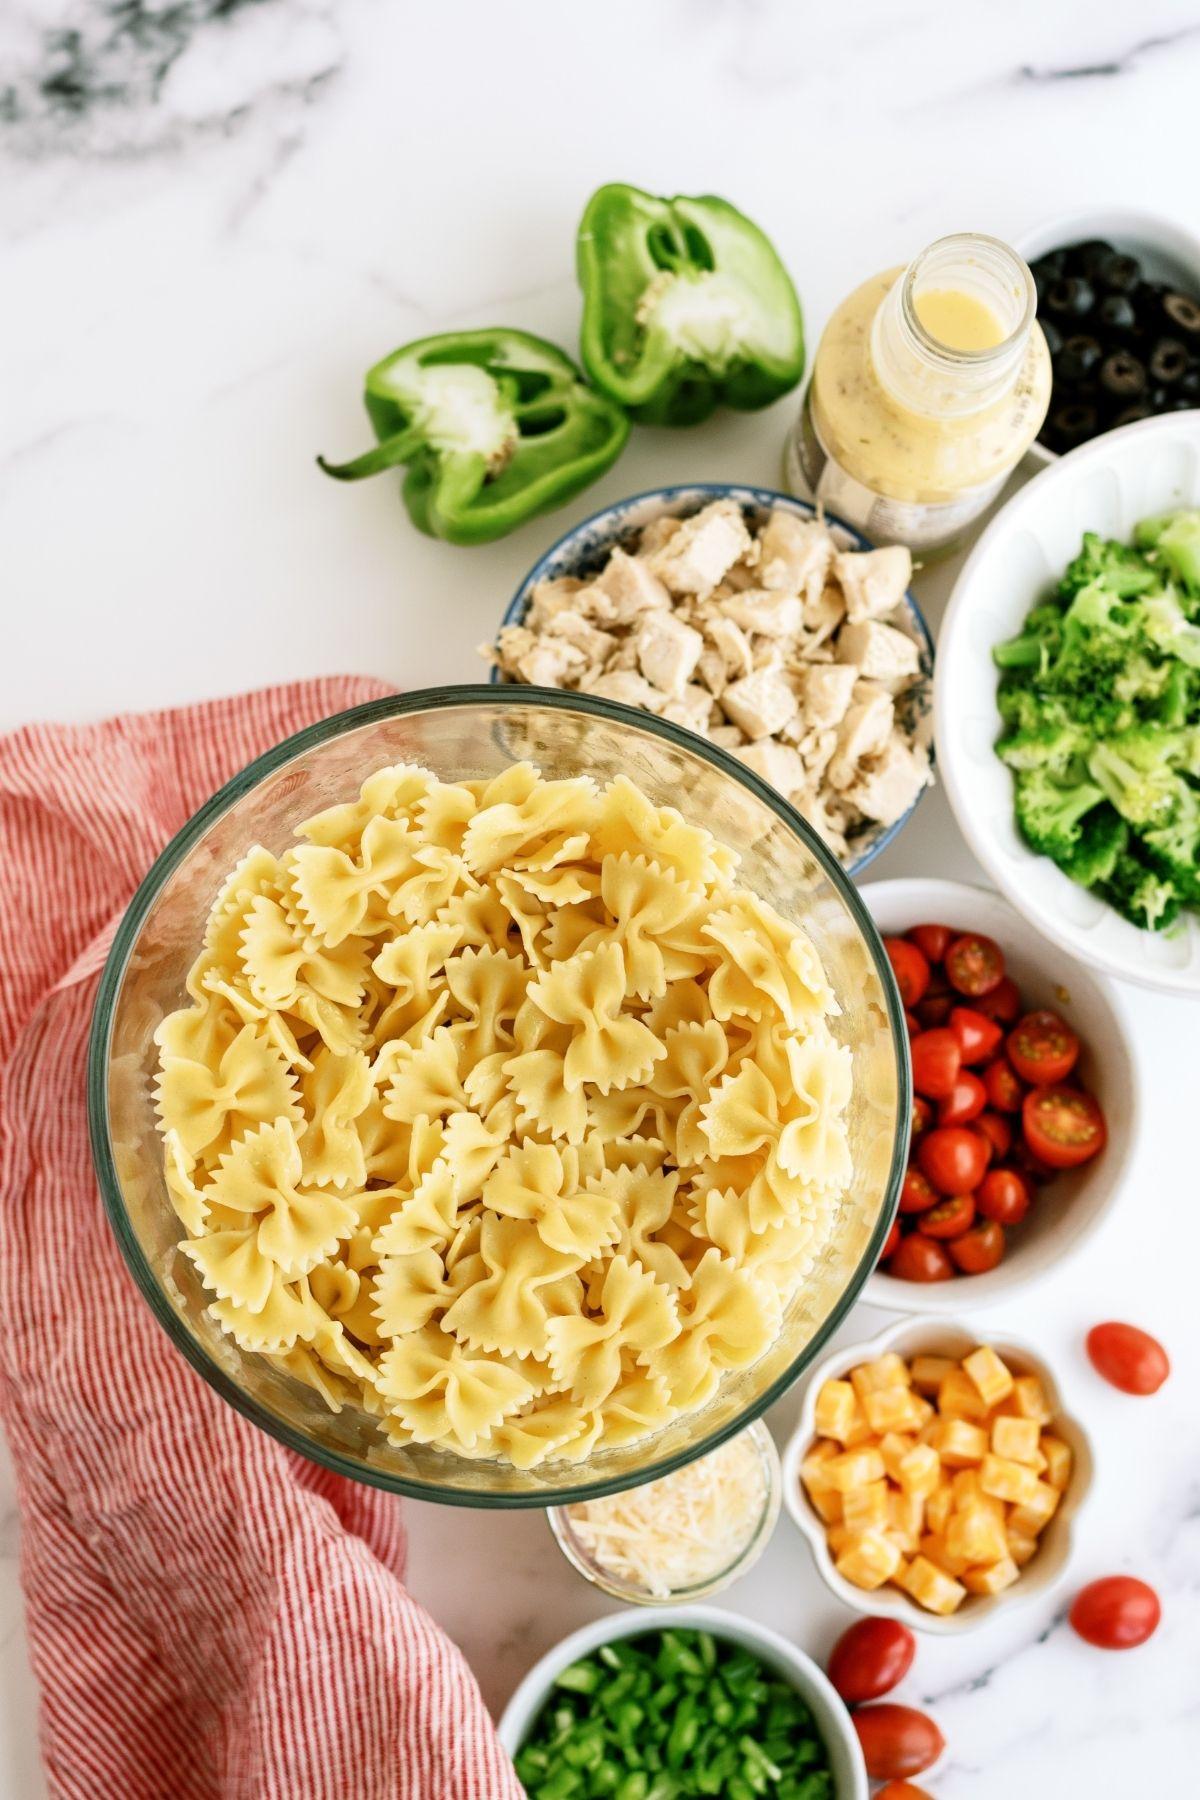 Ingredients for Grilled Chicken Bow Tie Pasta Salad Recipe